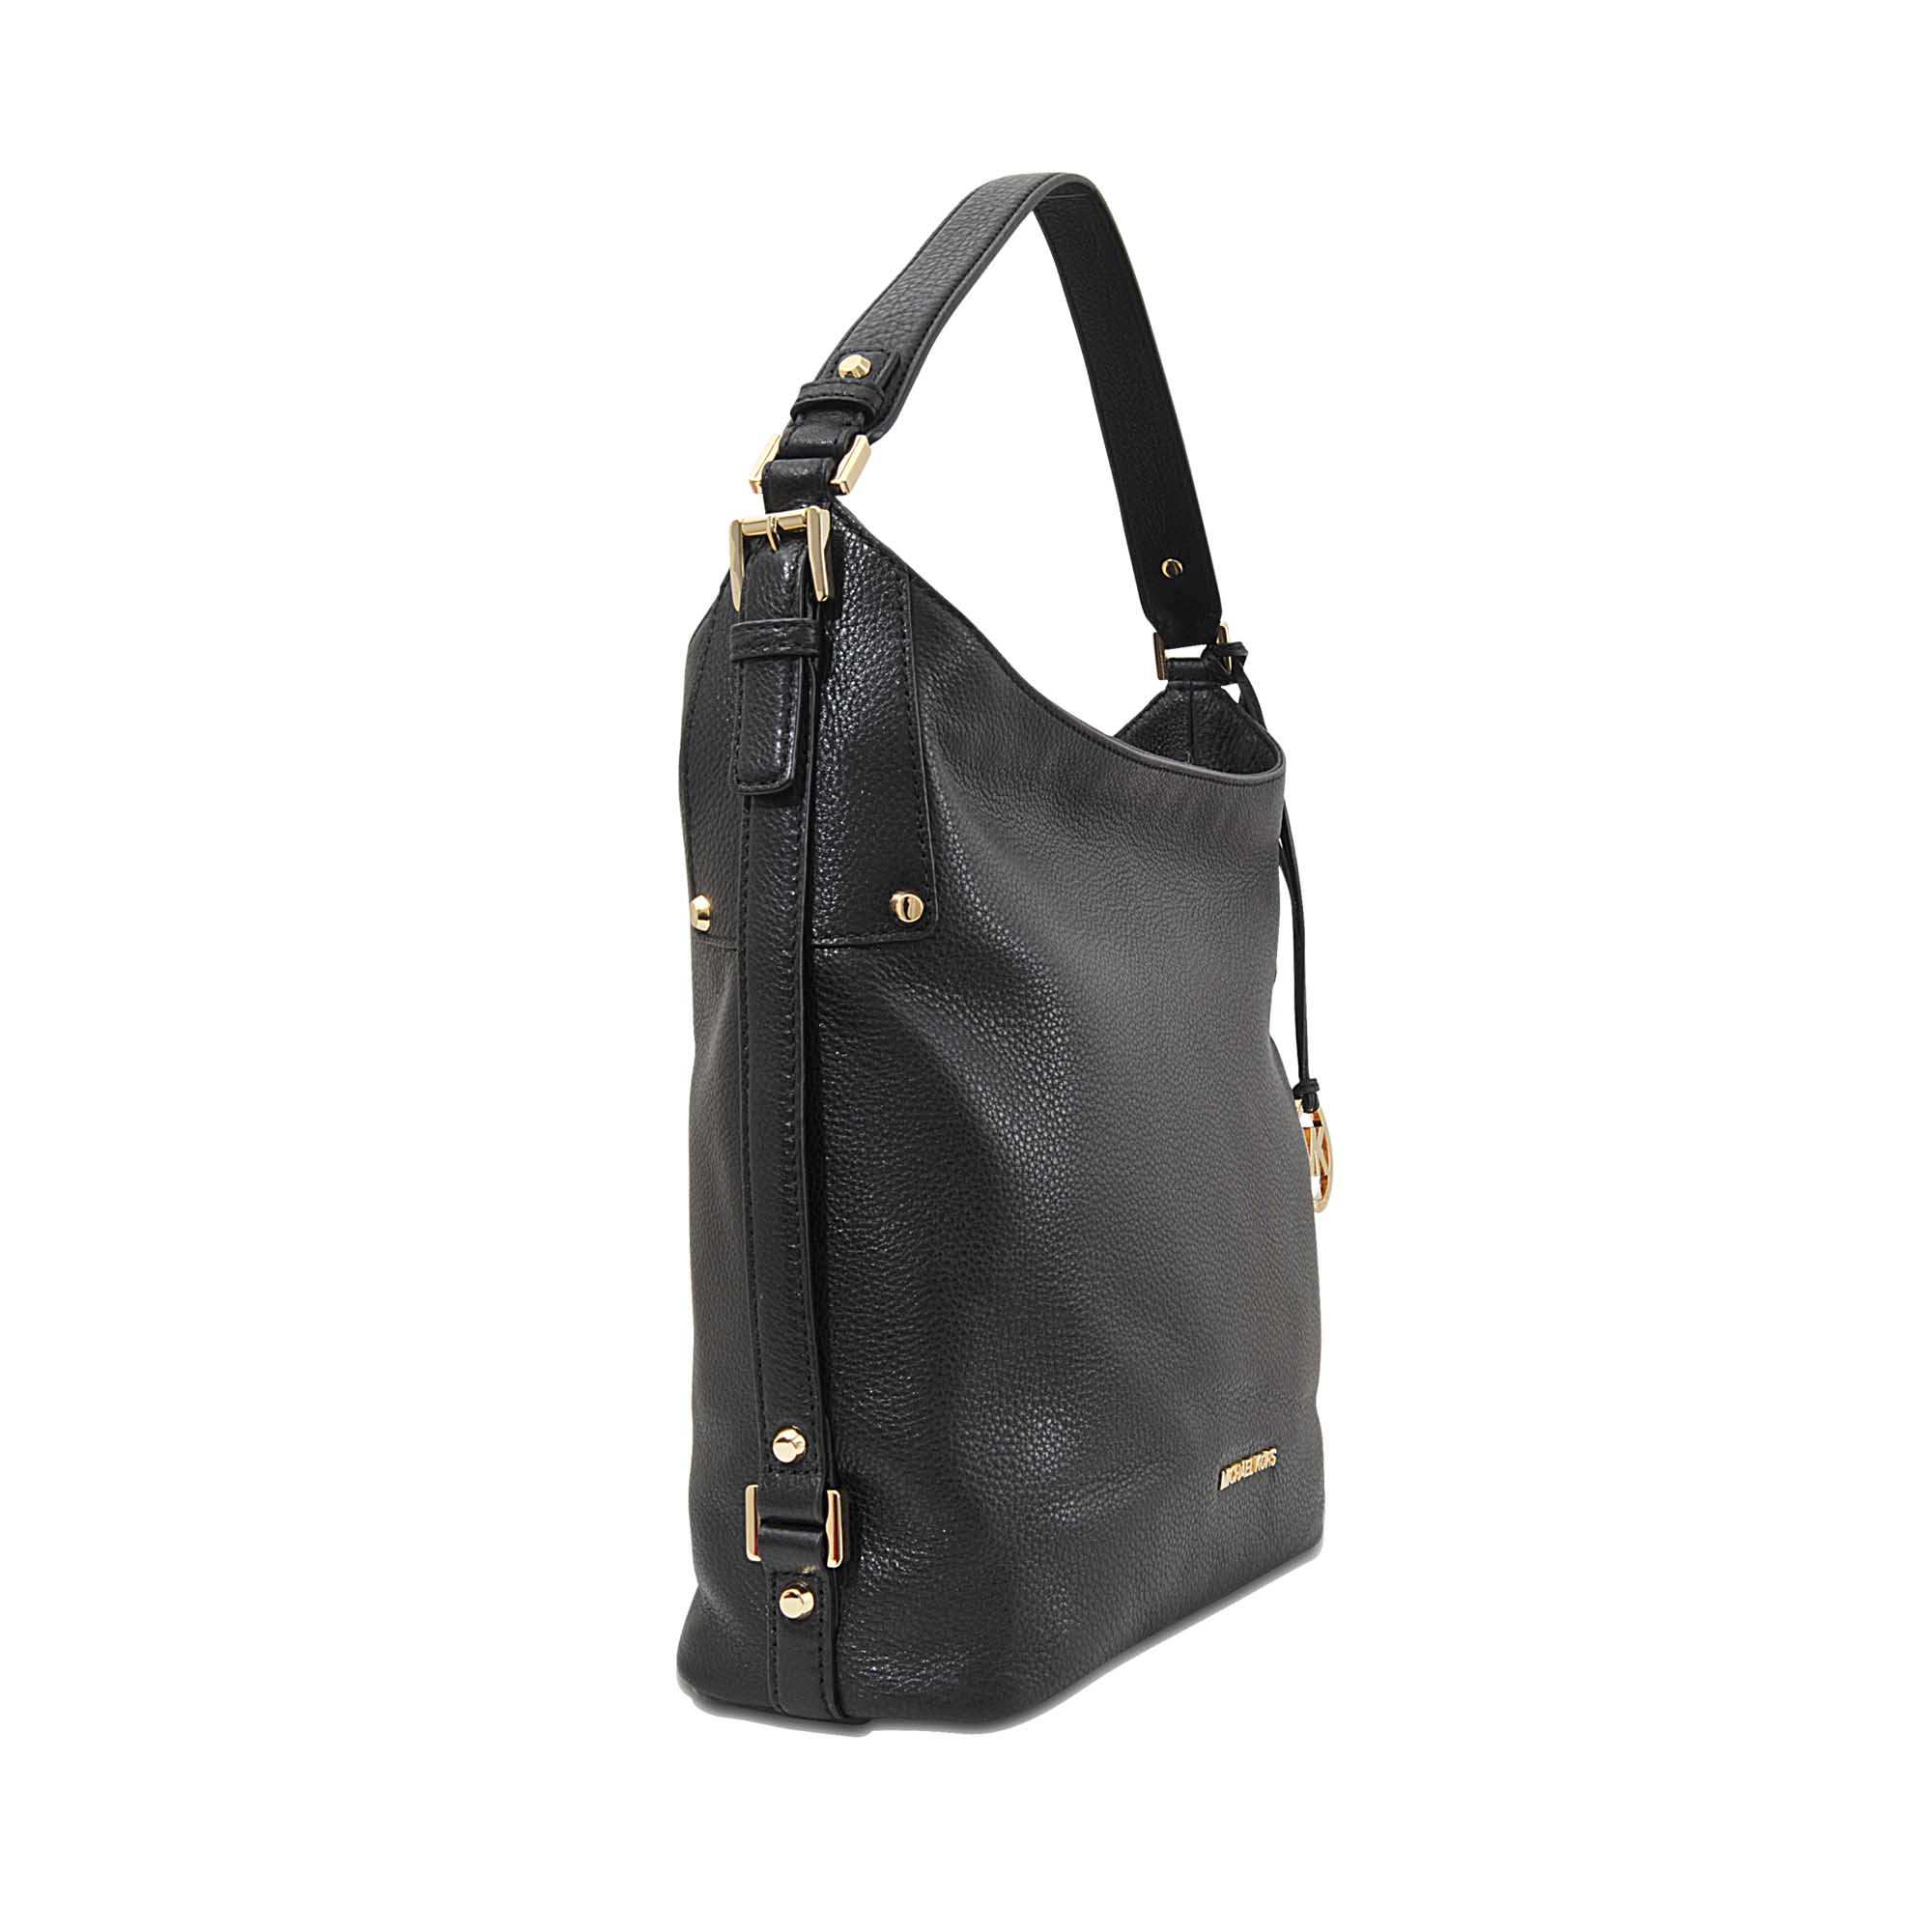 f3a3c9f3d8e5 Lyst - MICHAEL Michael Kors Bedford Medium Belted Lg Shoulder Bag in ...